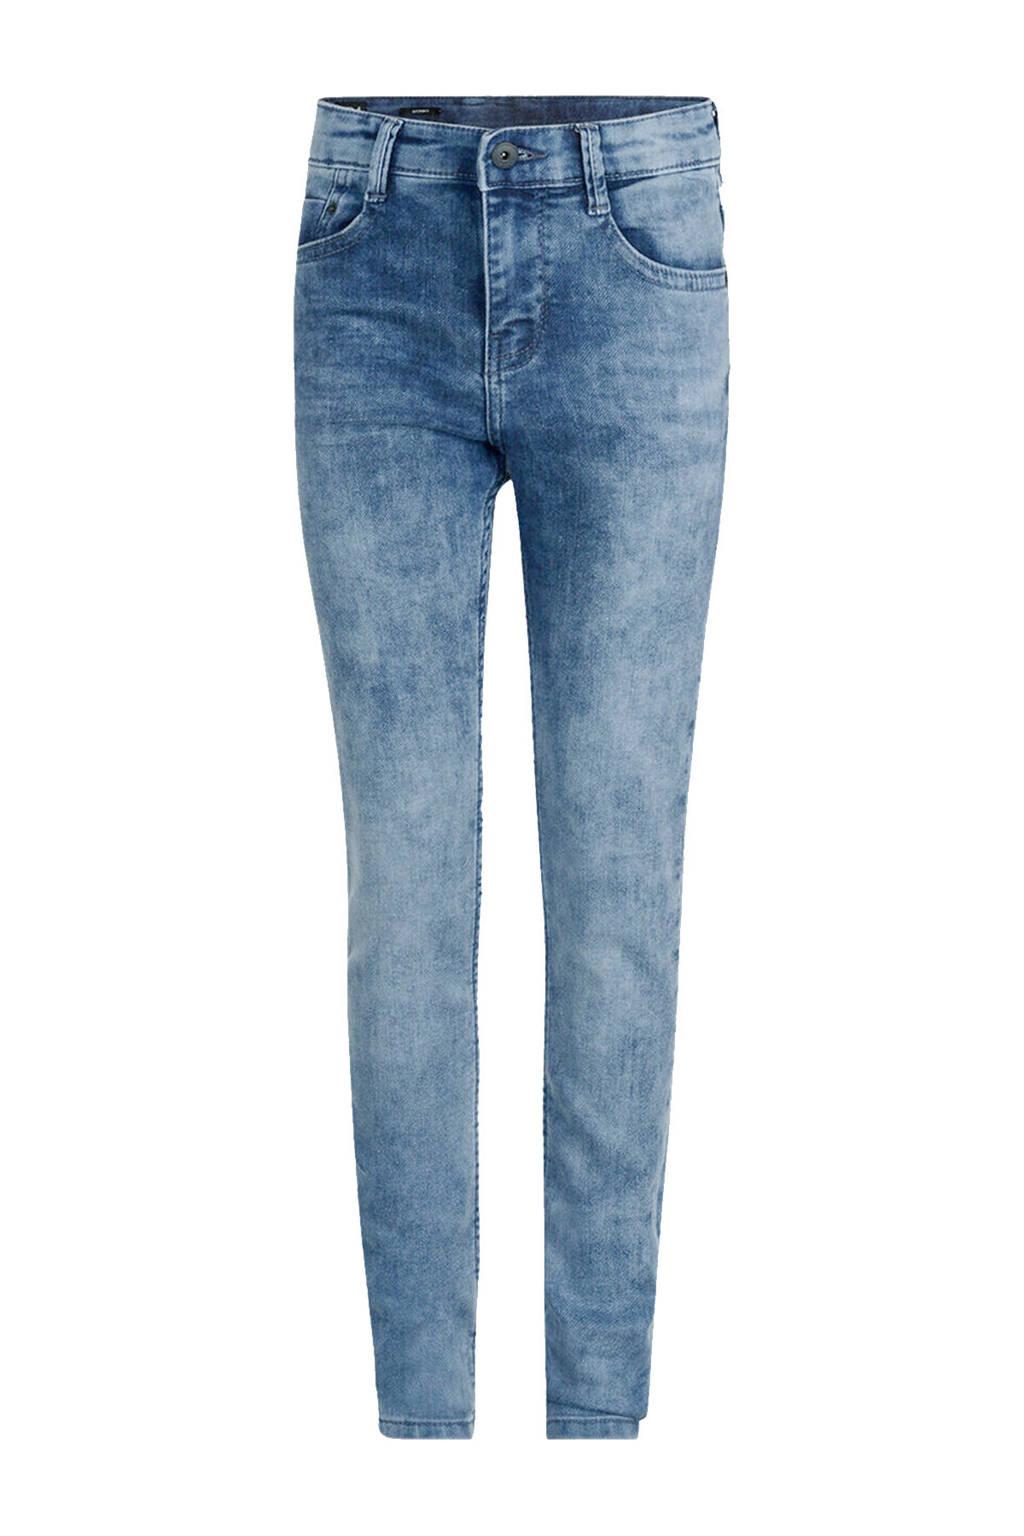 Shoeby Jill & Mitch skinny jeans Boogy dark denim, Dark denim